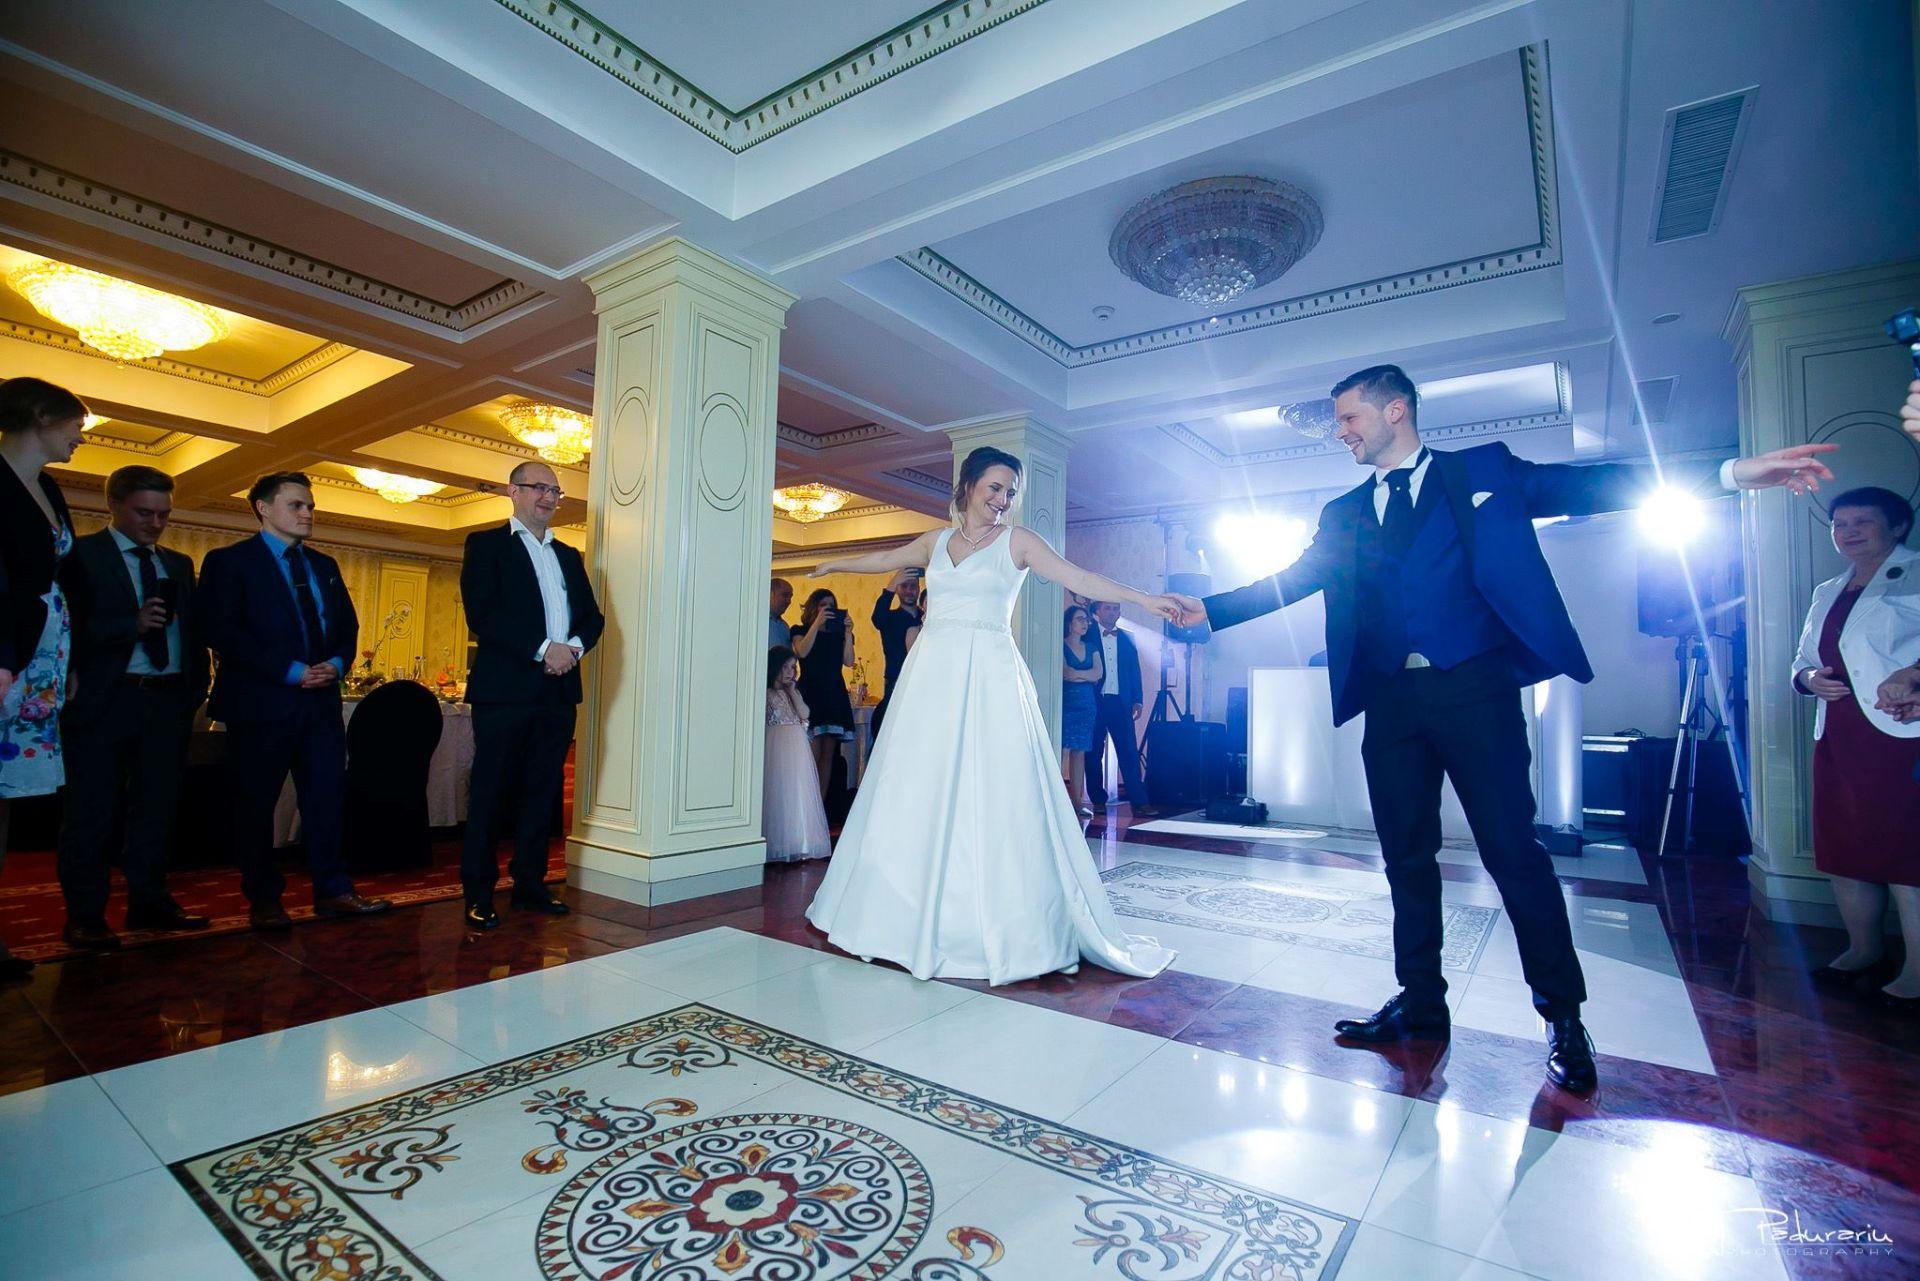 Alex si Natalia nunta Sala Regala La Castel Iasi - fotograf profesionist nunta iasi Paul Padurariu 2019 15